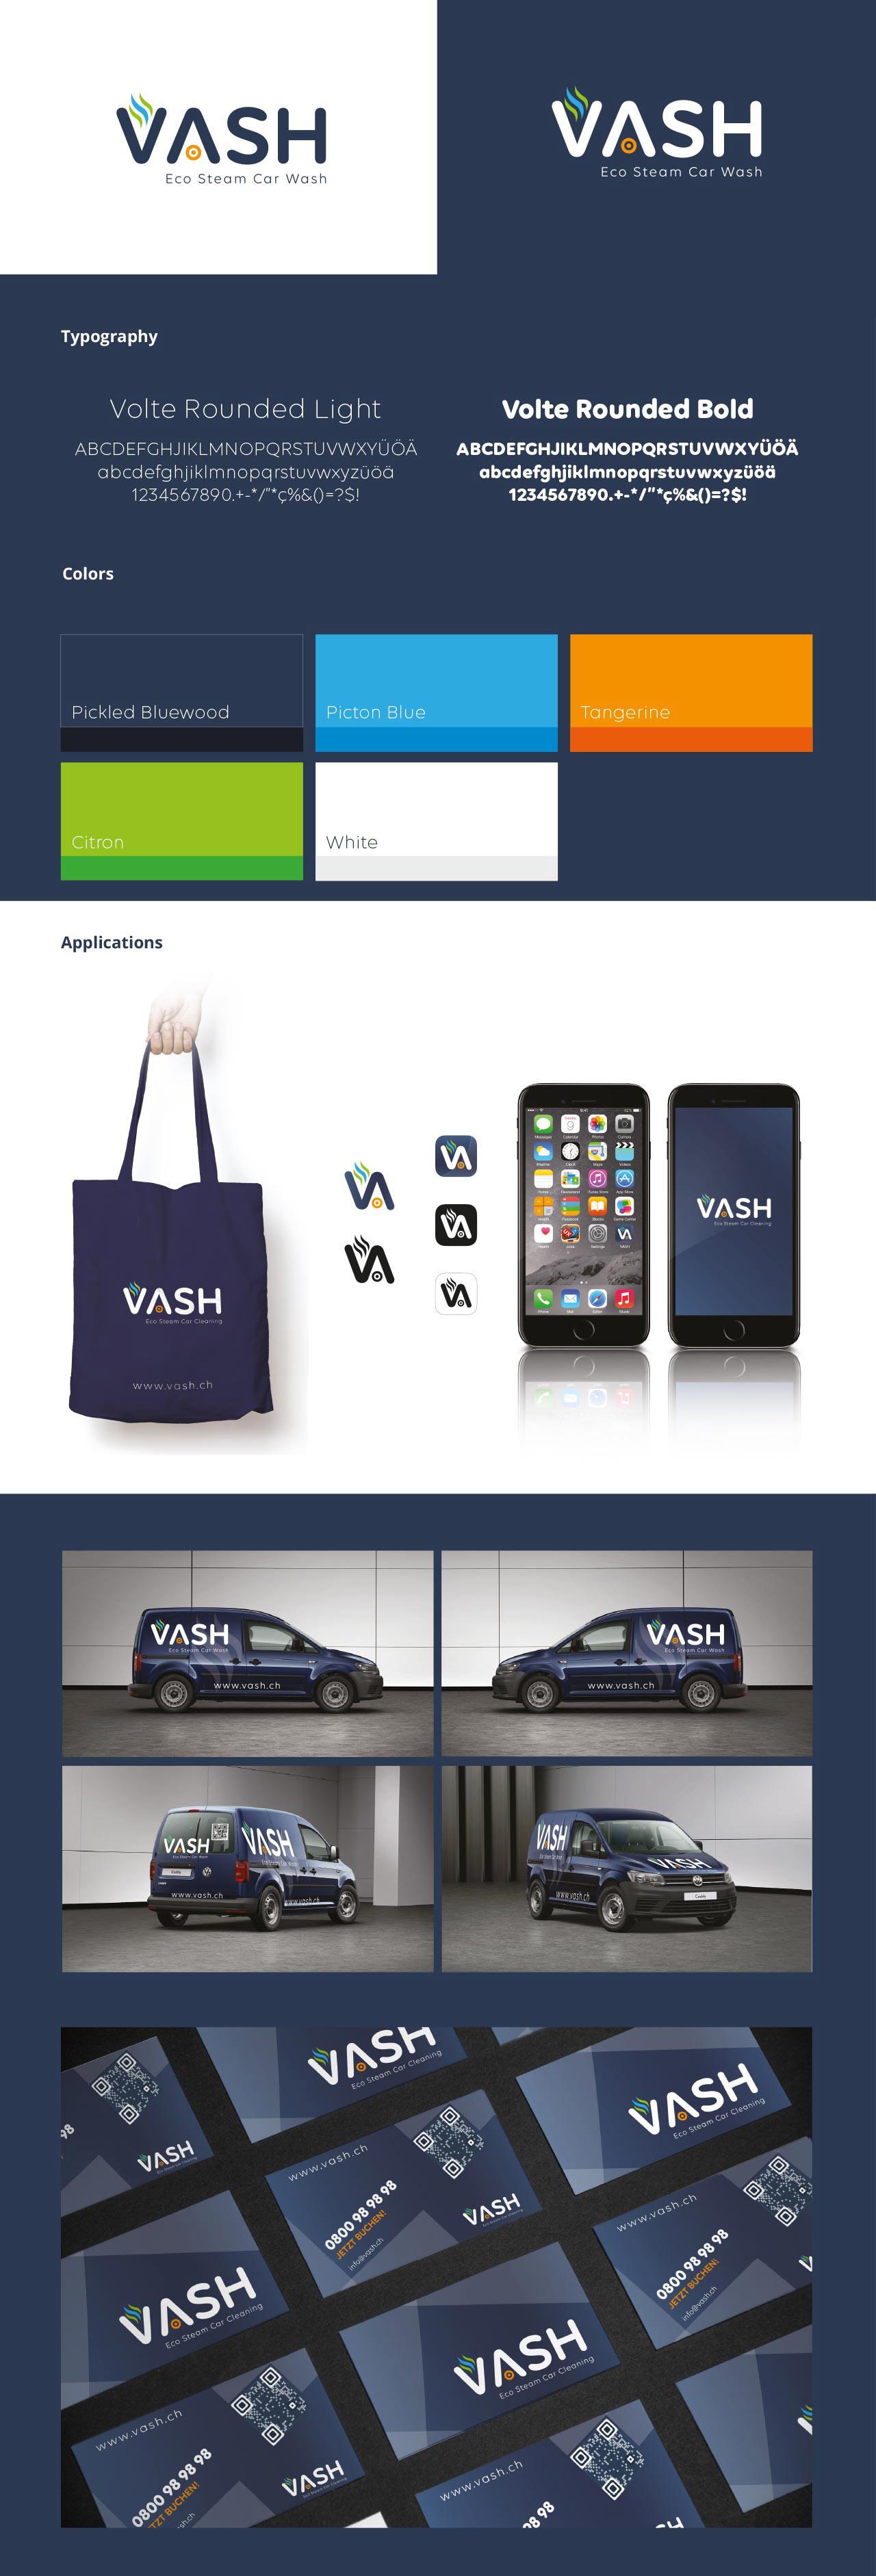 vash_portfolio_applications_2